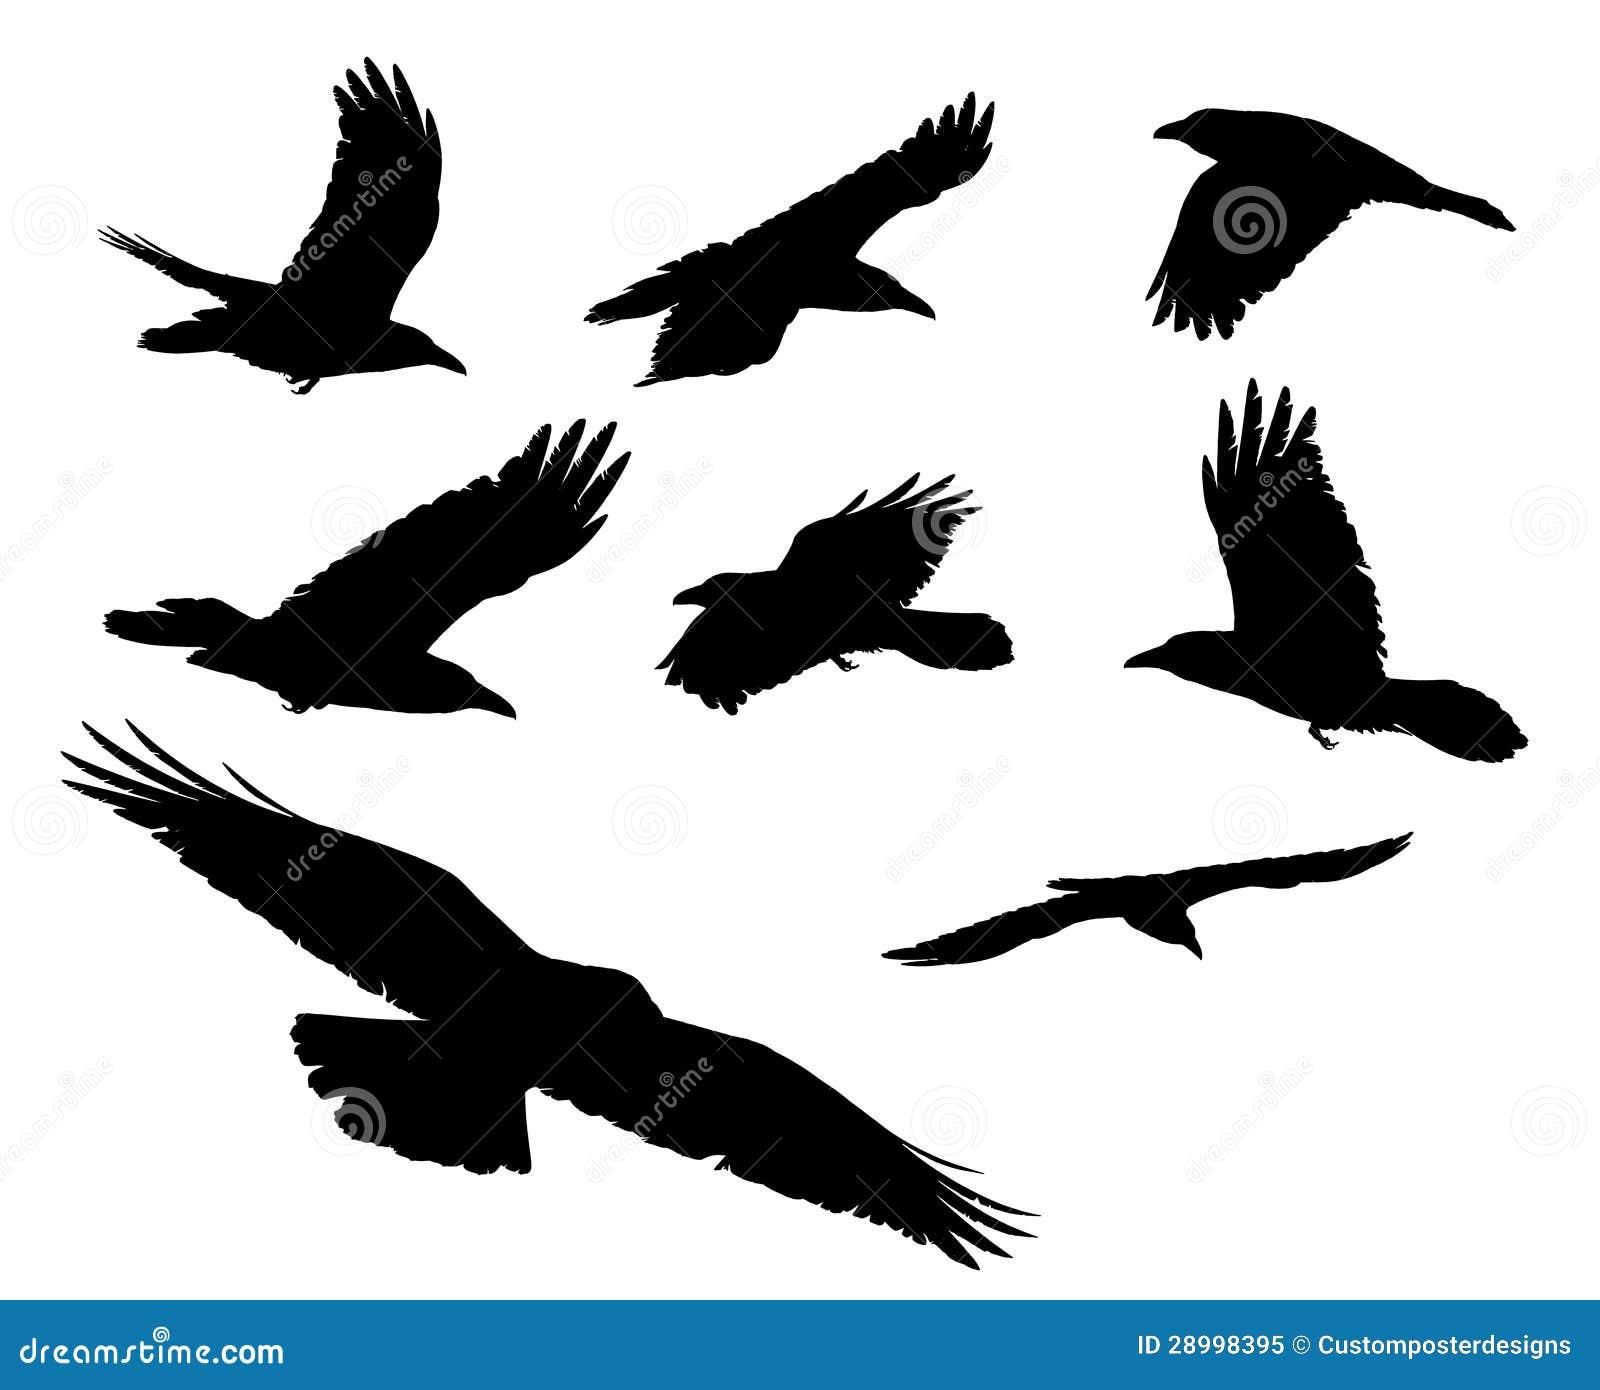 black crows royalty free stock photo image 28998395